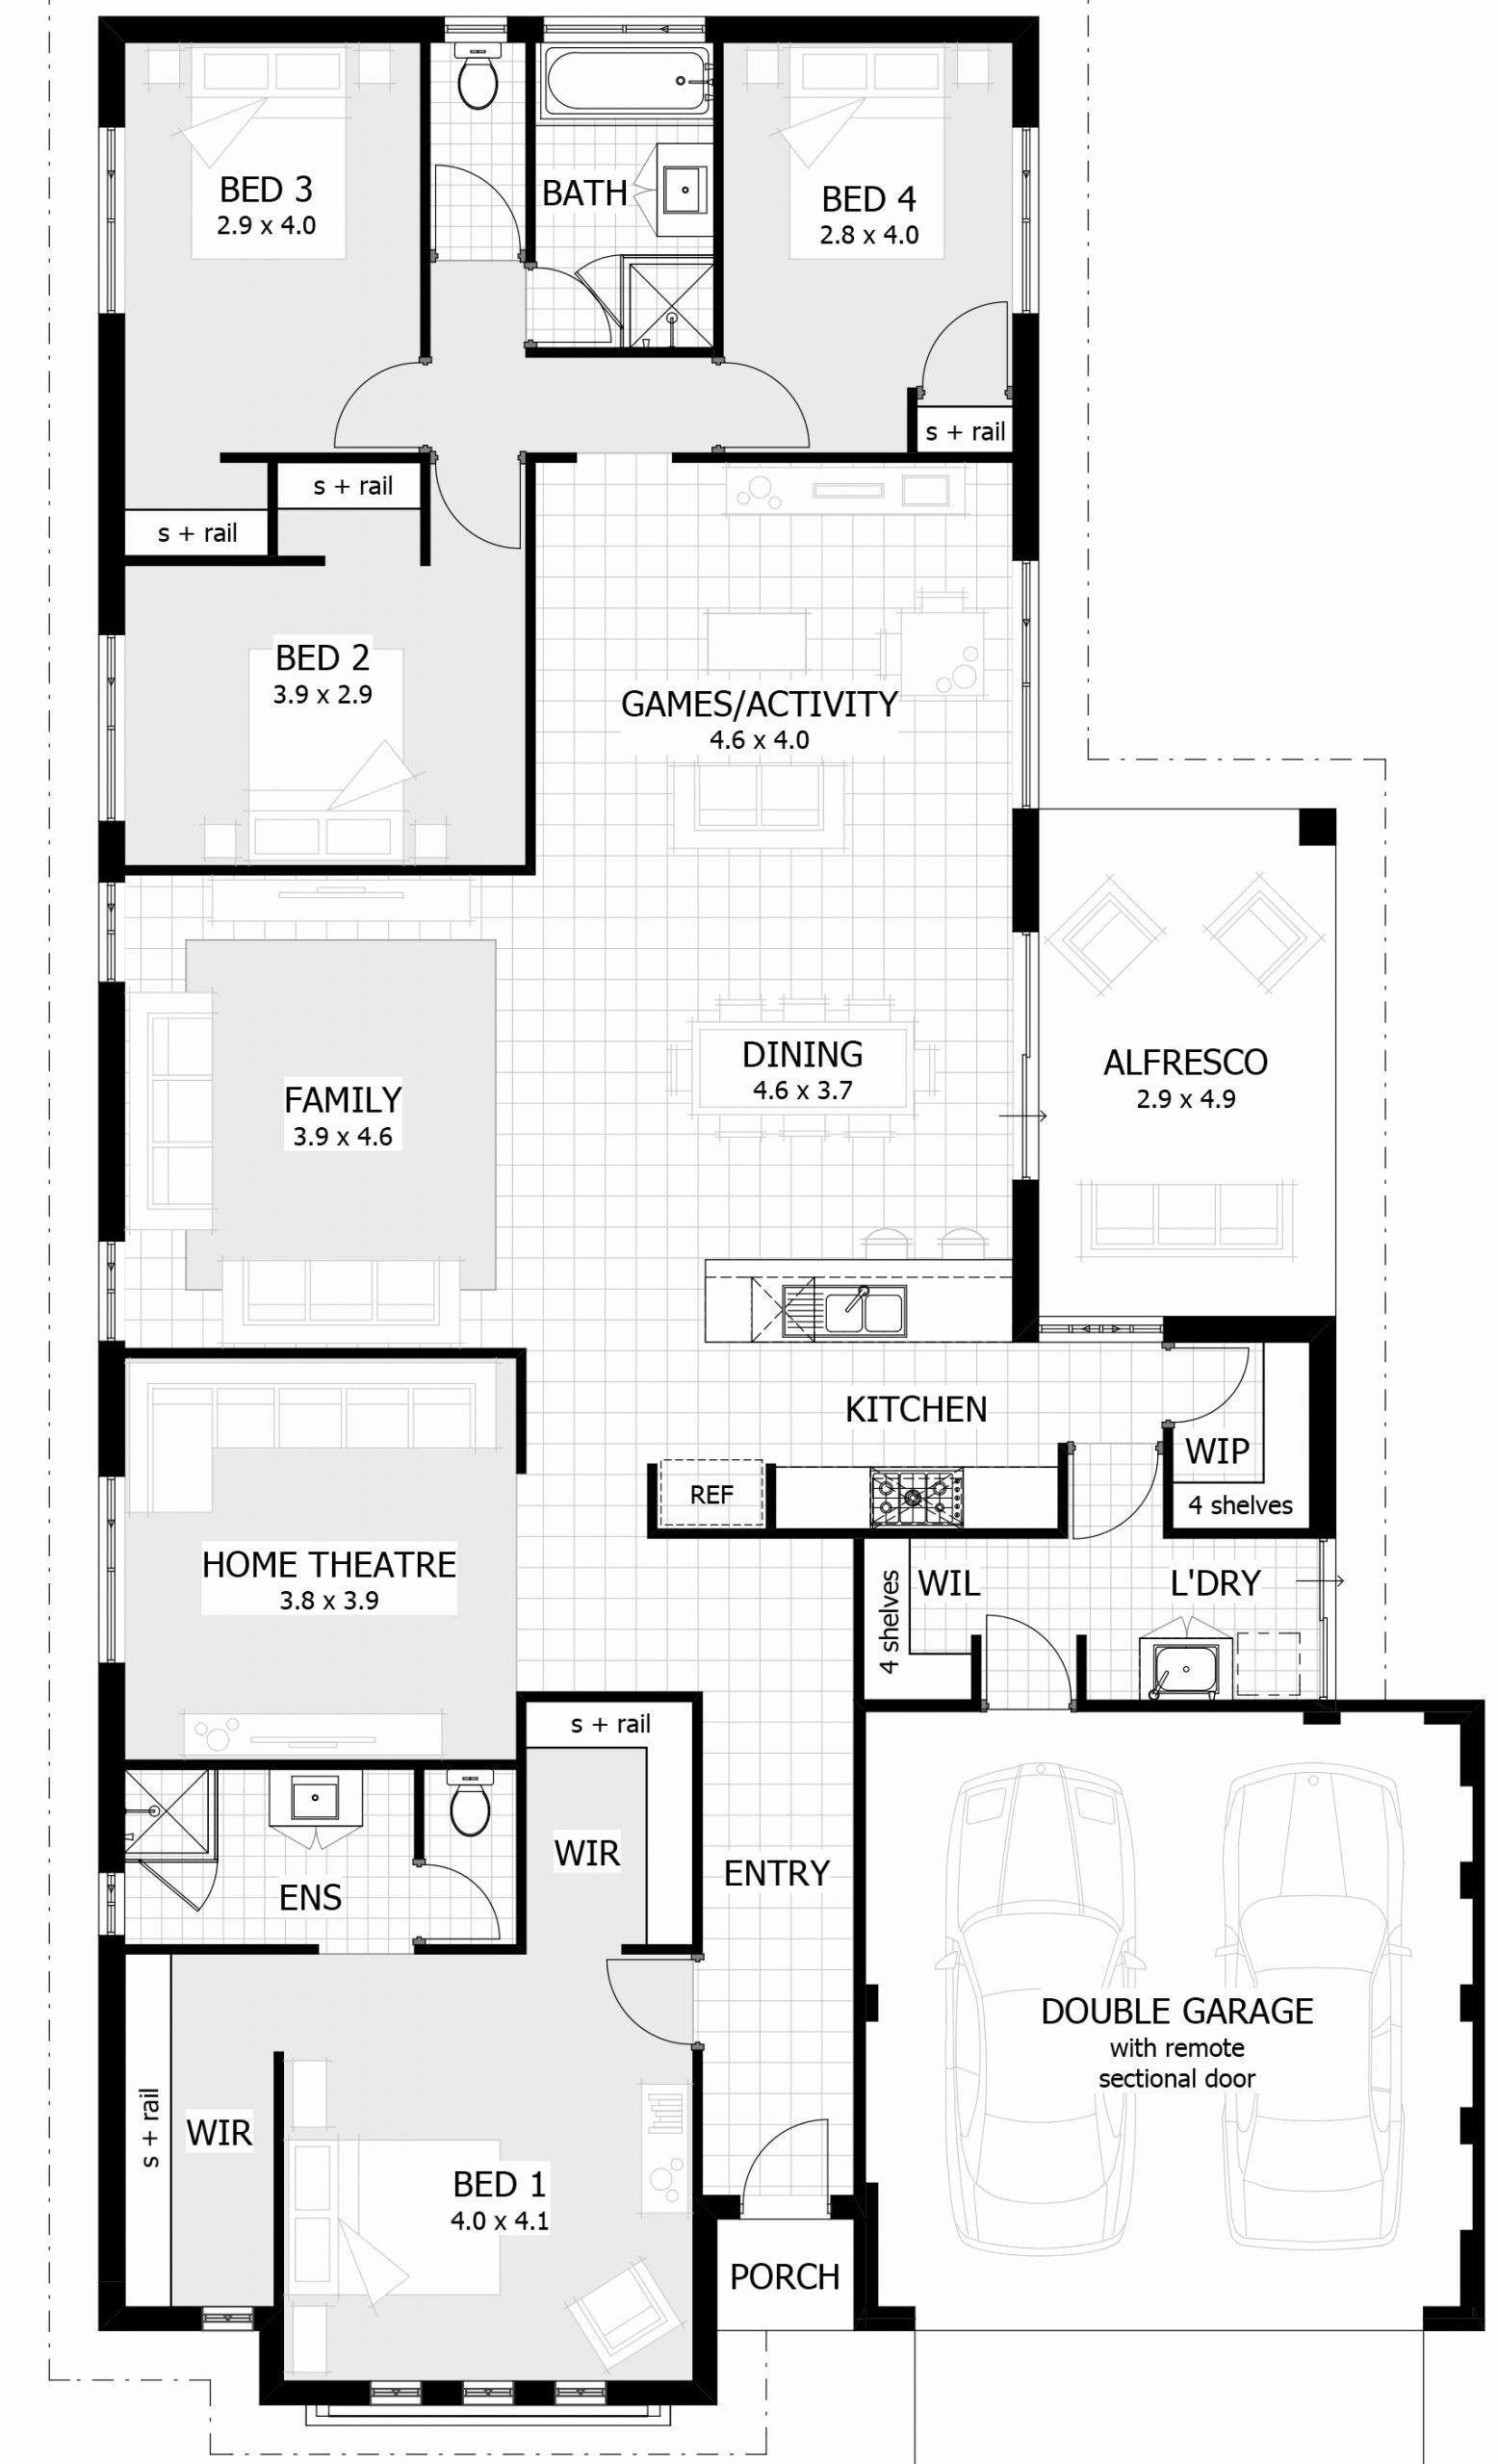 16 Simple 6 Bedroom House Plans In